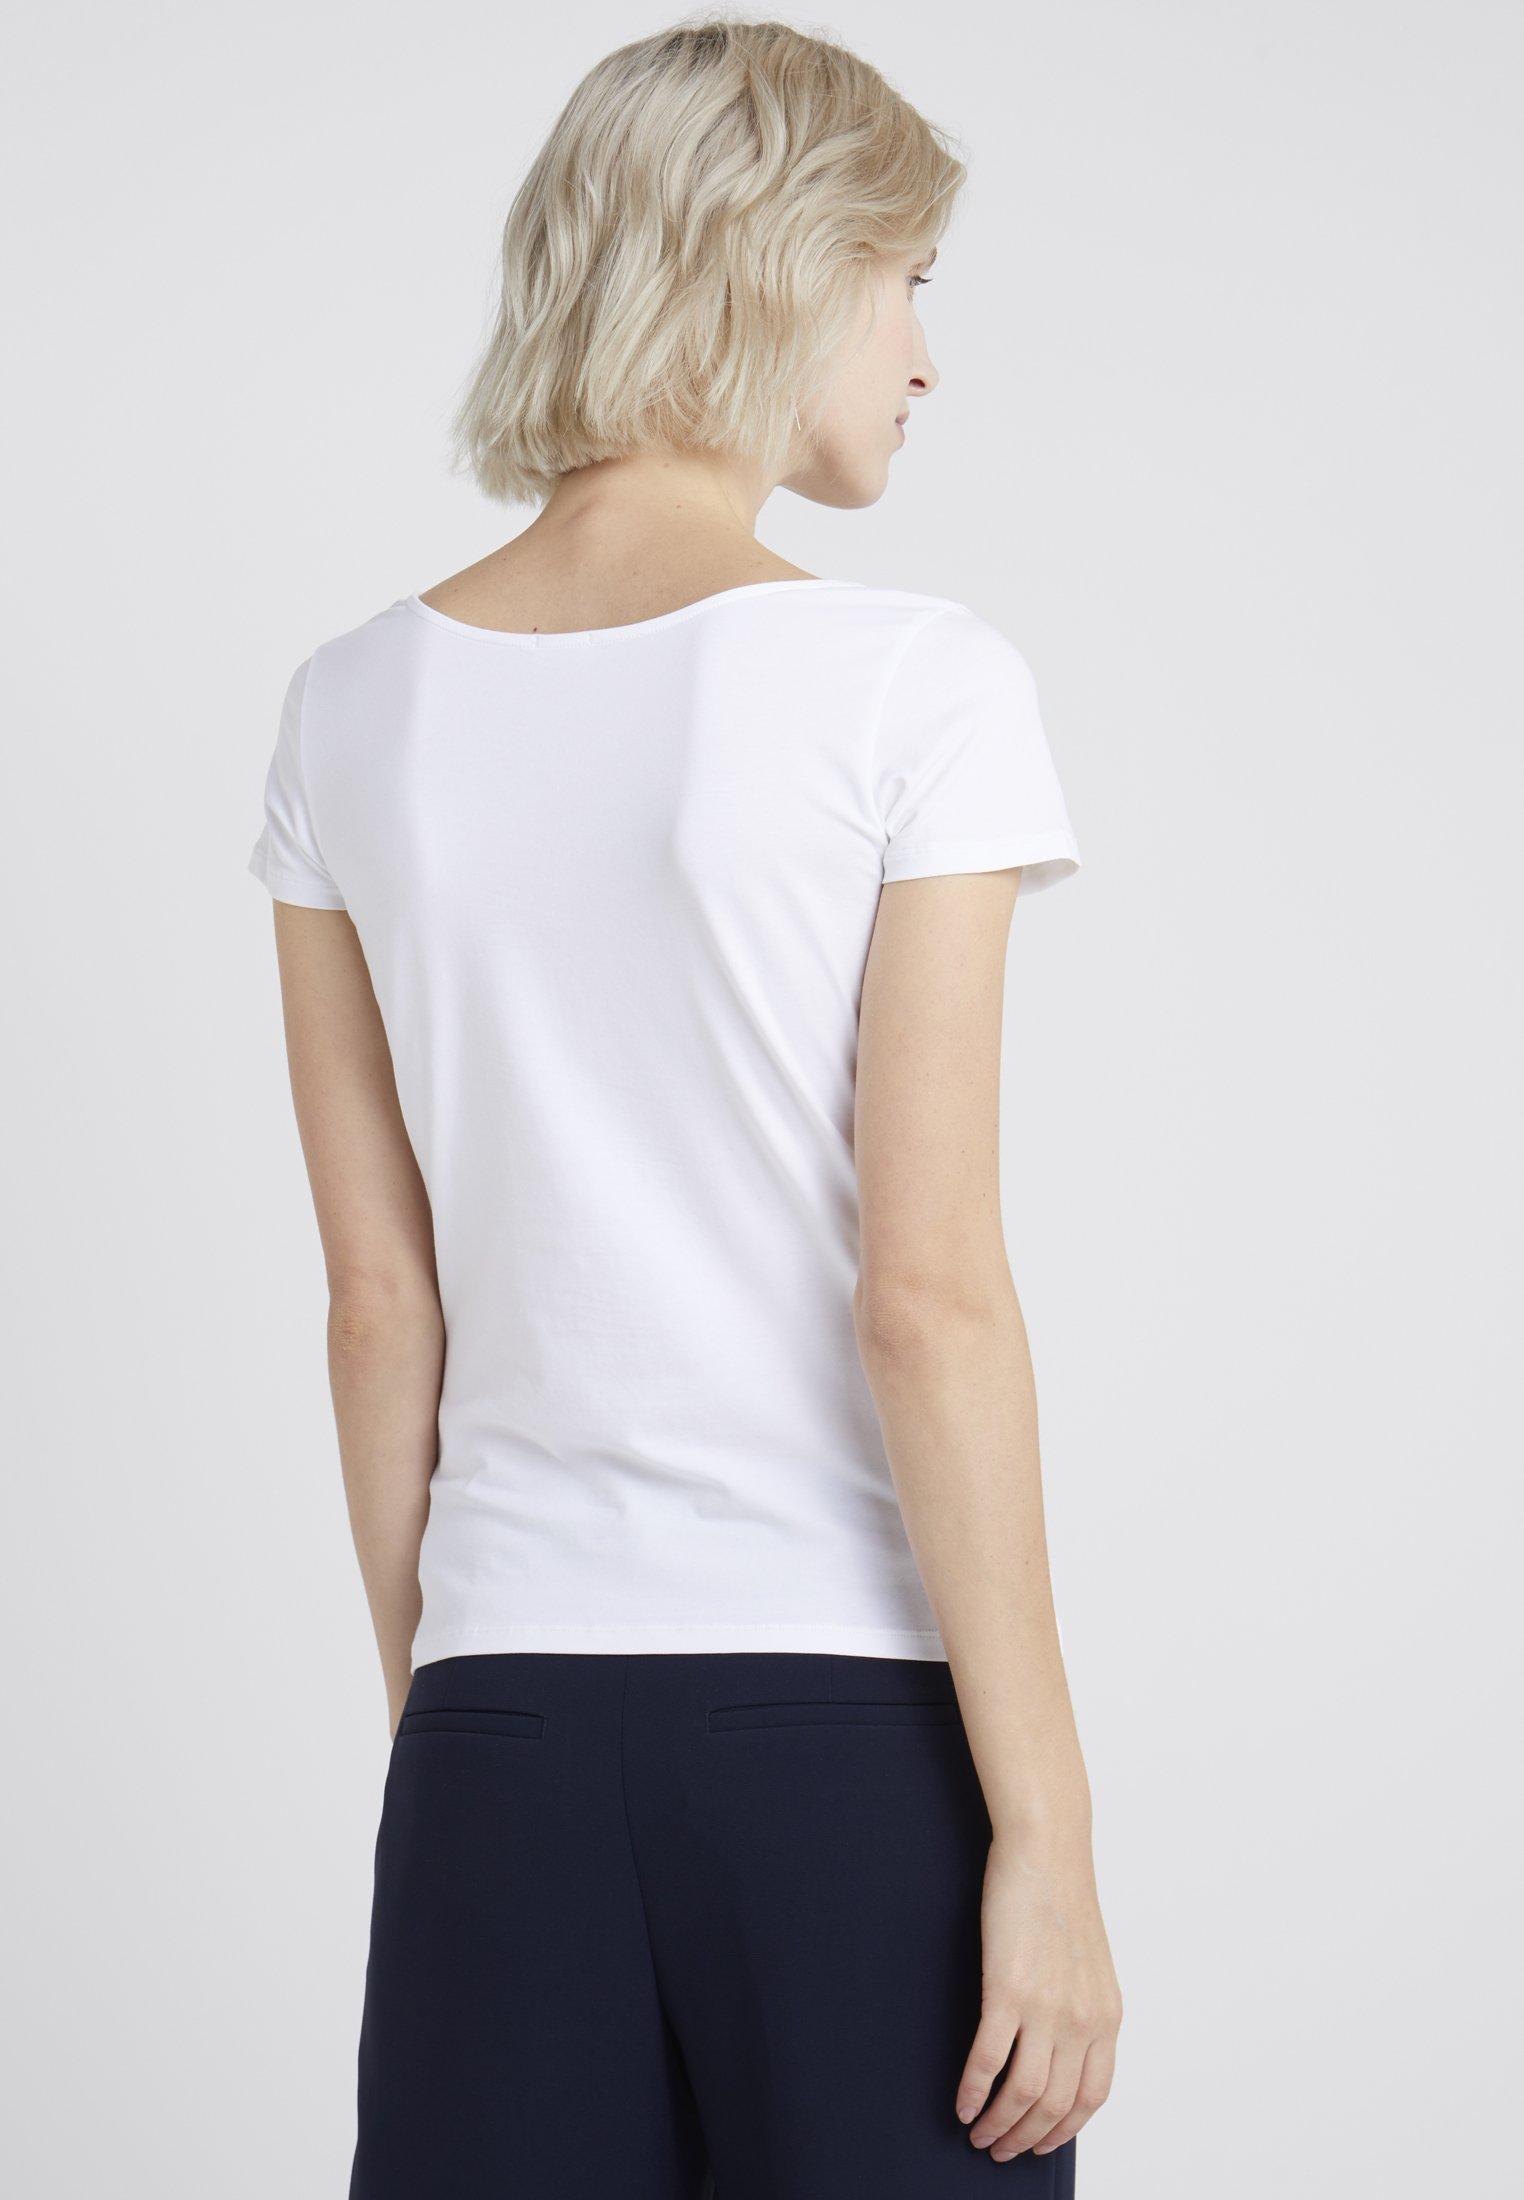 White shirt Neck TopT K Scoop Filippa Basique uJclKT1F3